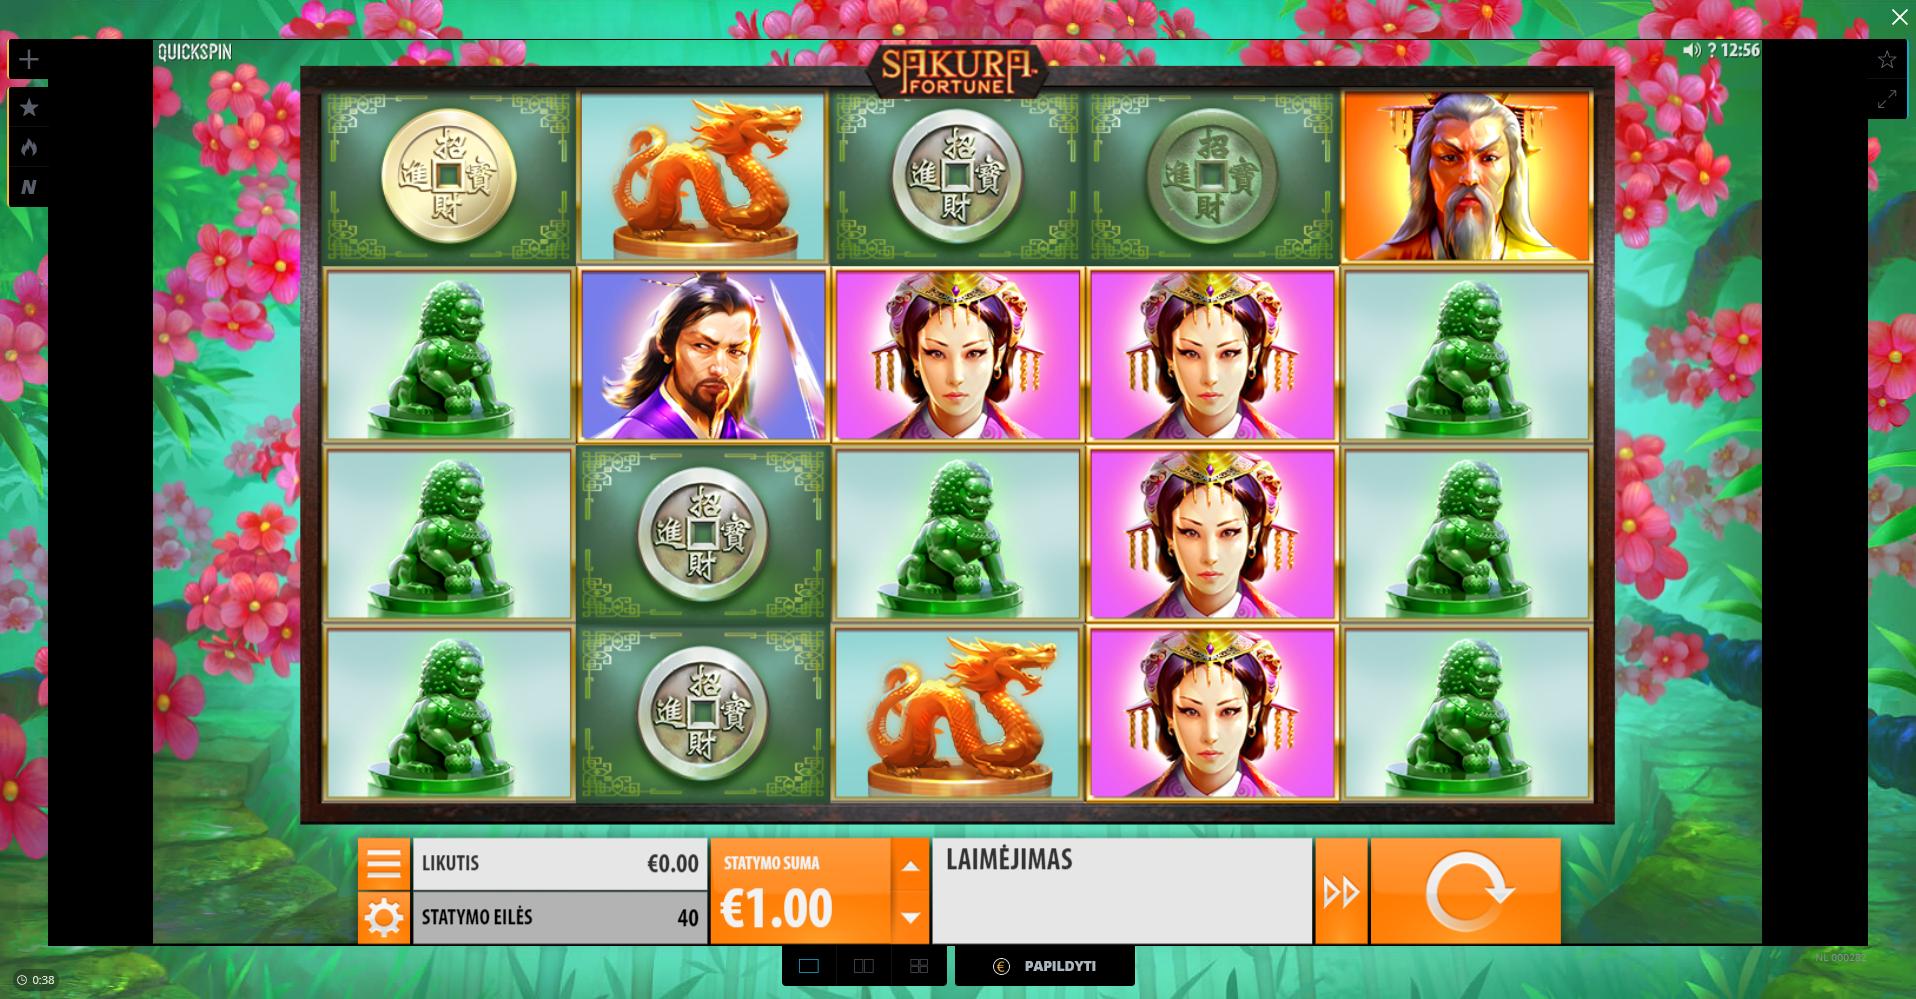 uniclub casino quickspin sakura fortune